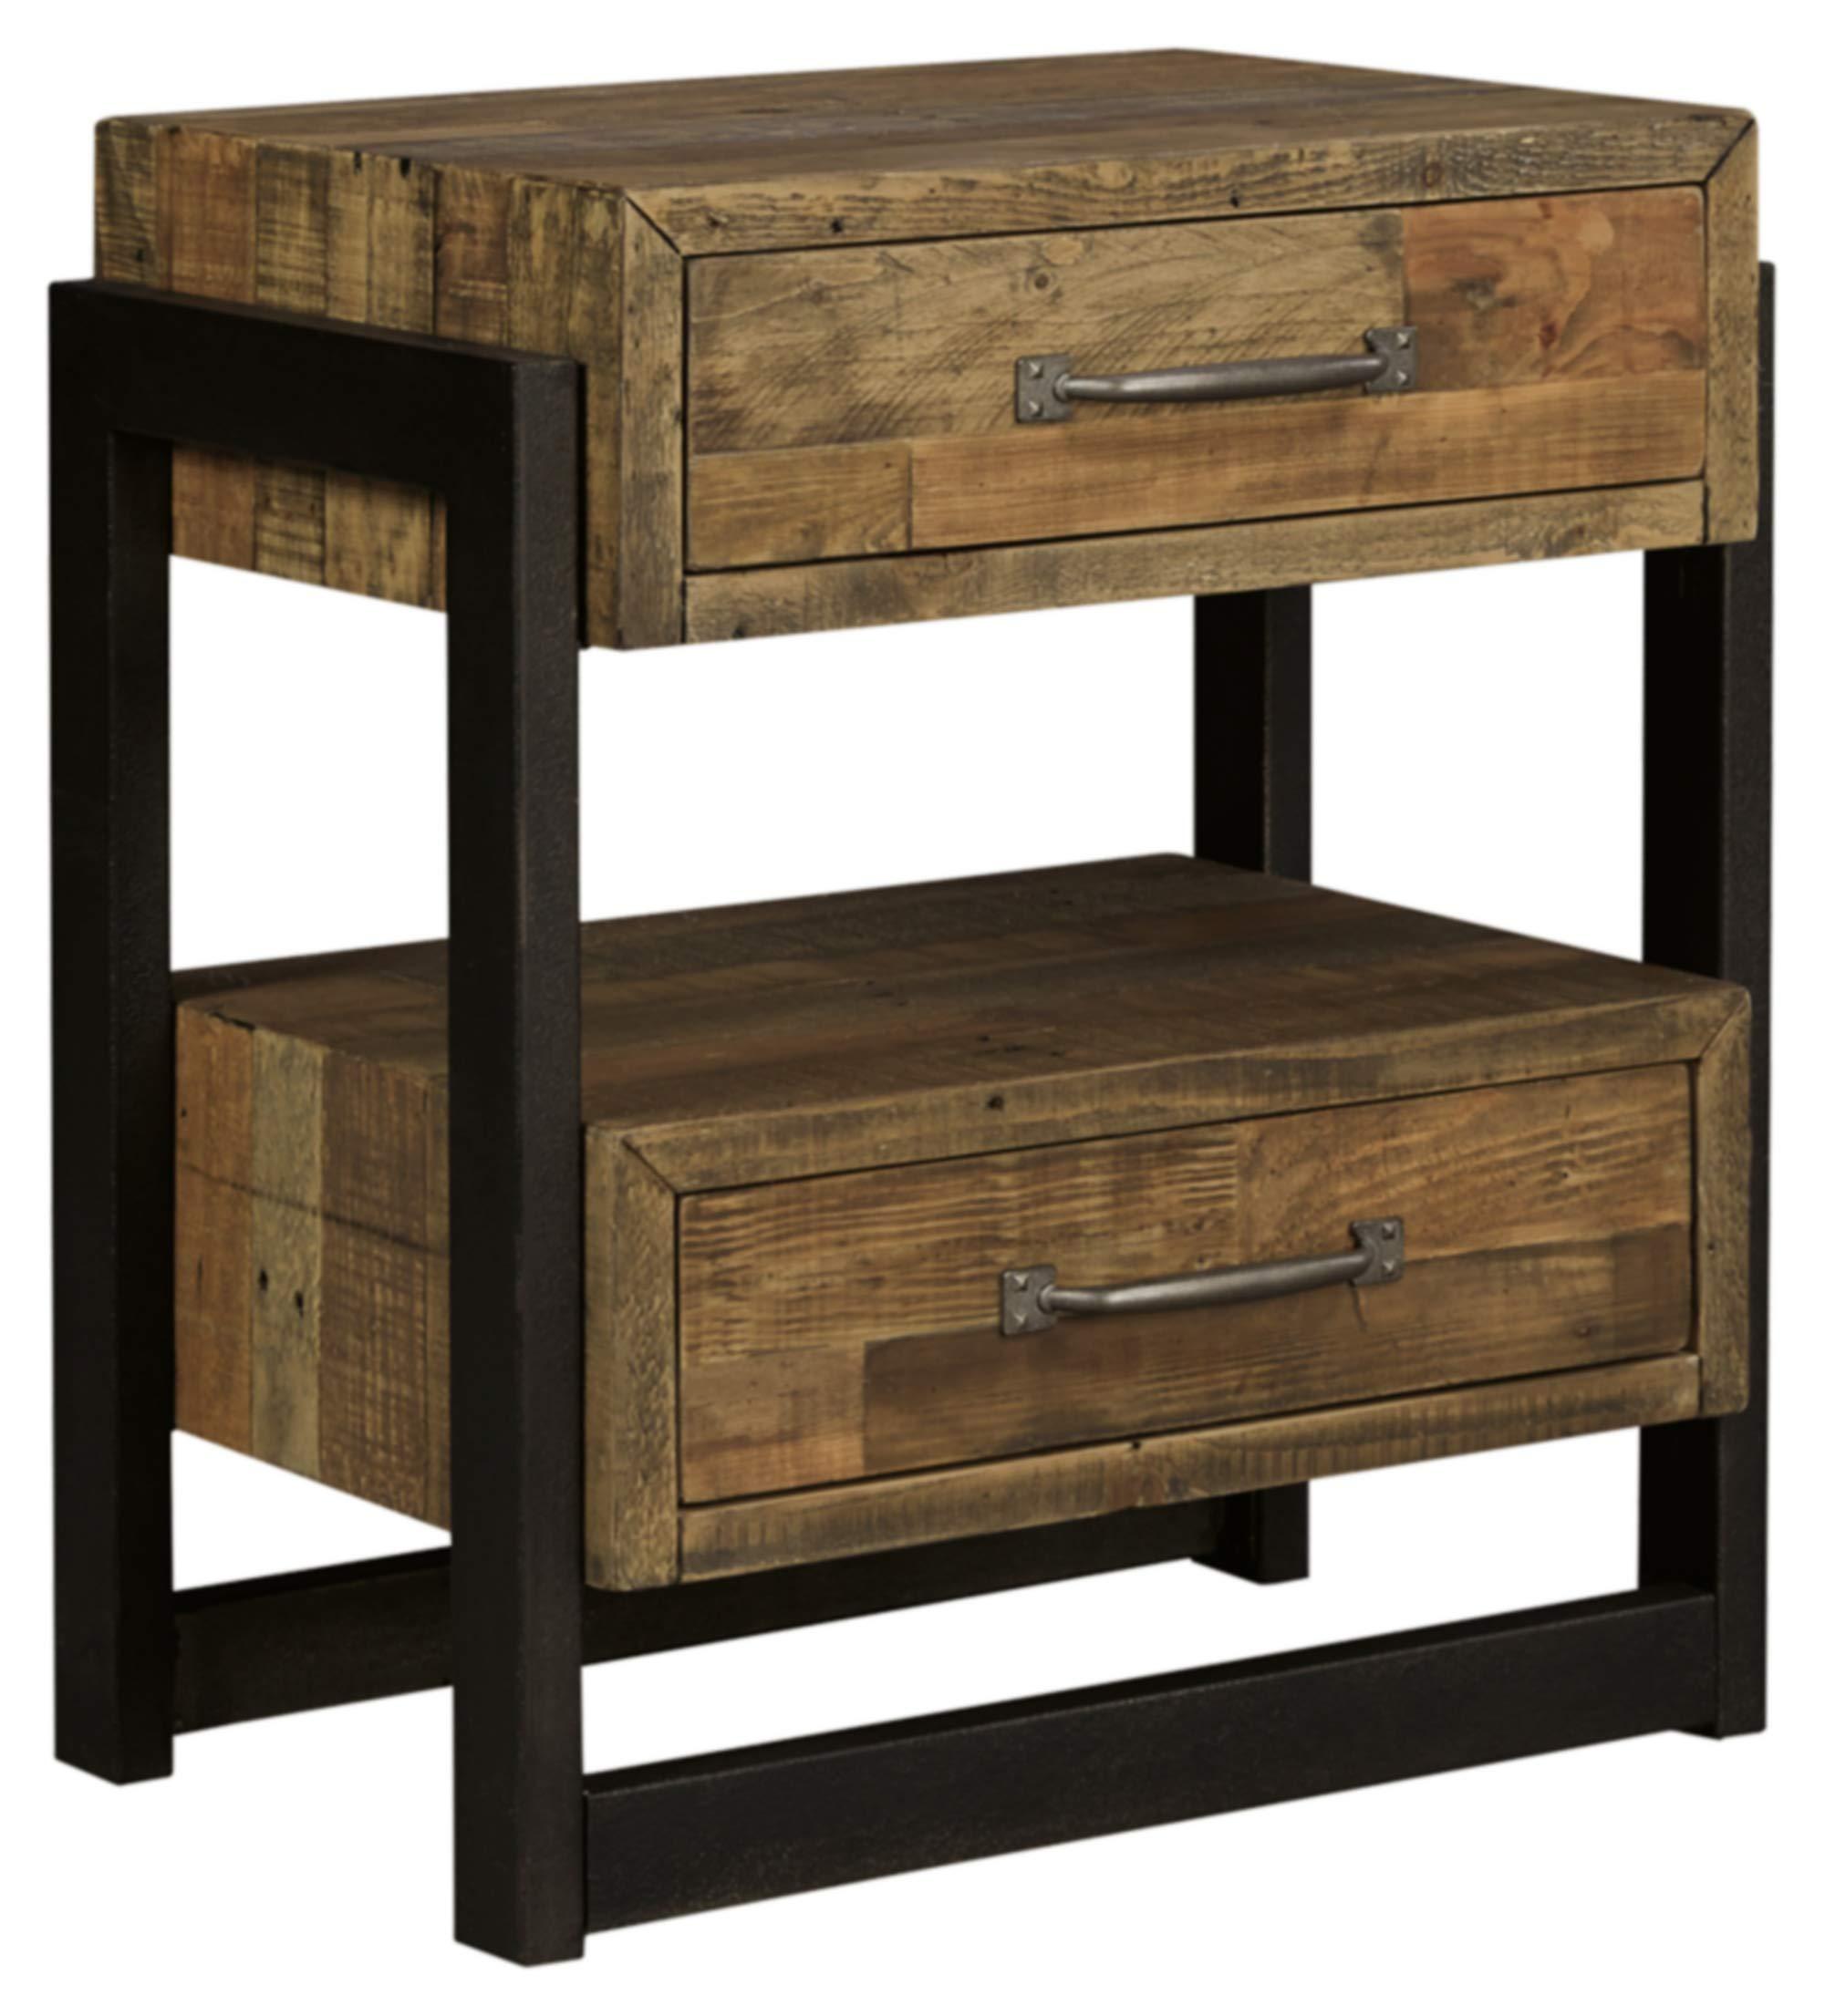 Ashley Furniture Signature Design - Sommerford Nightstand - Brown by Signature Design by Ashley